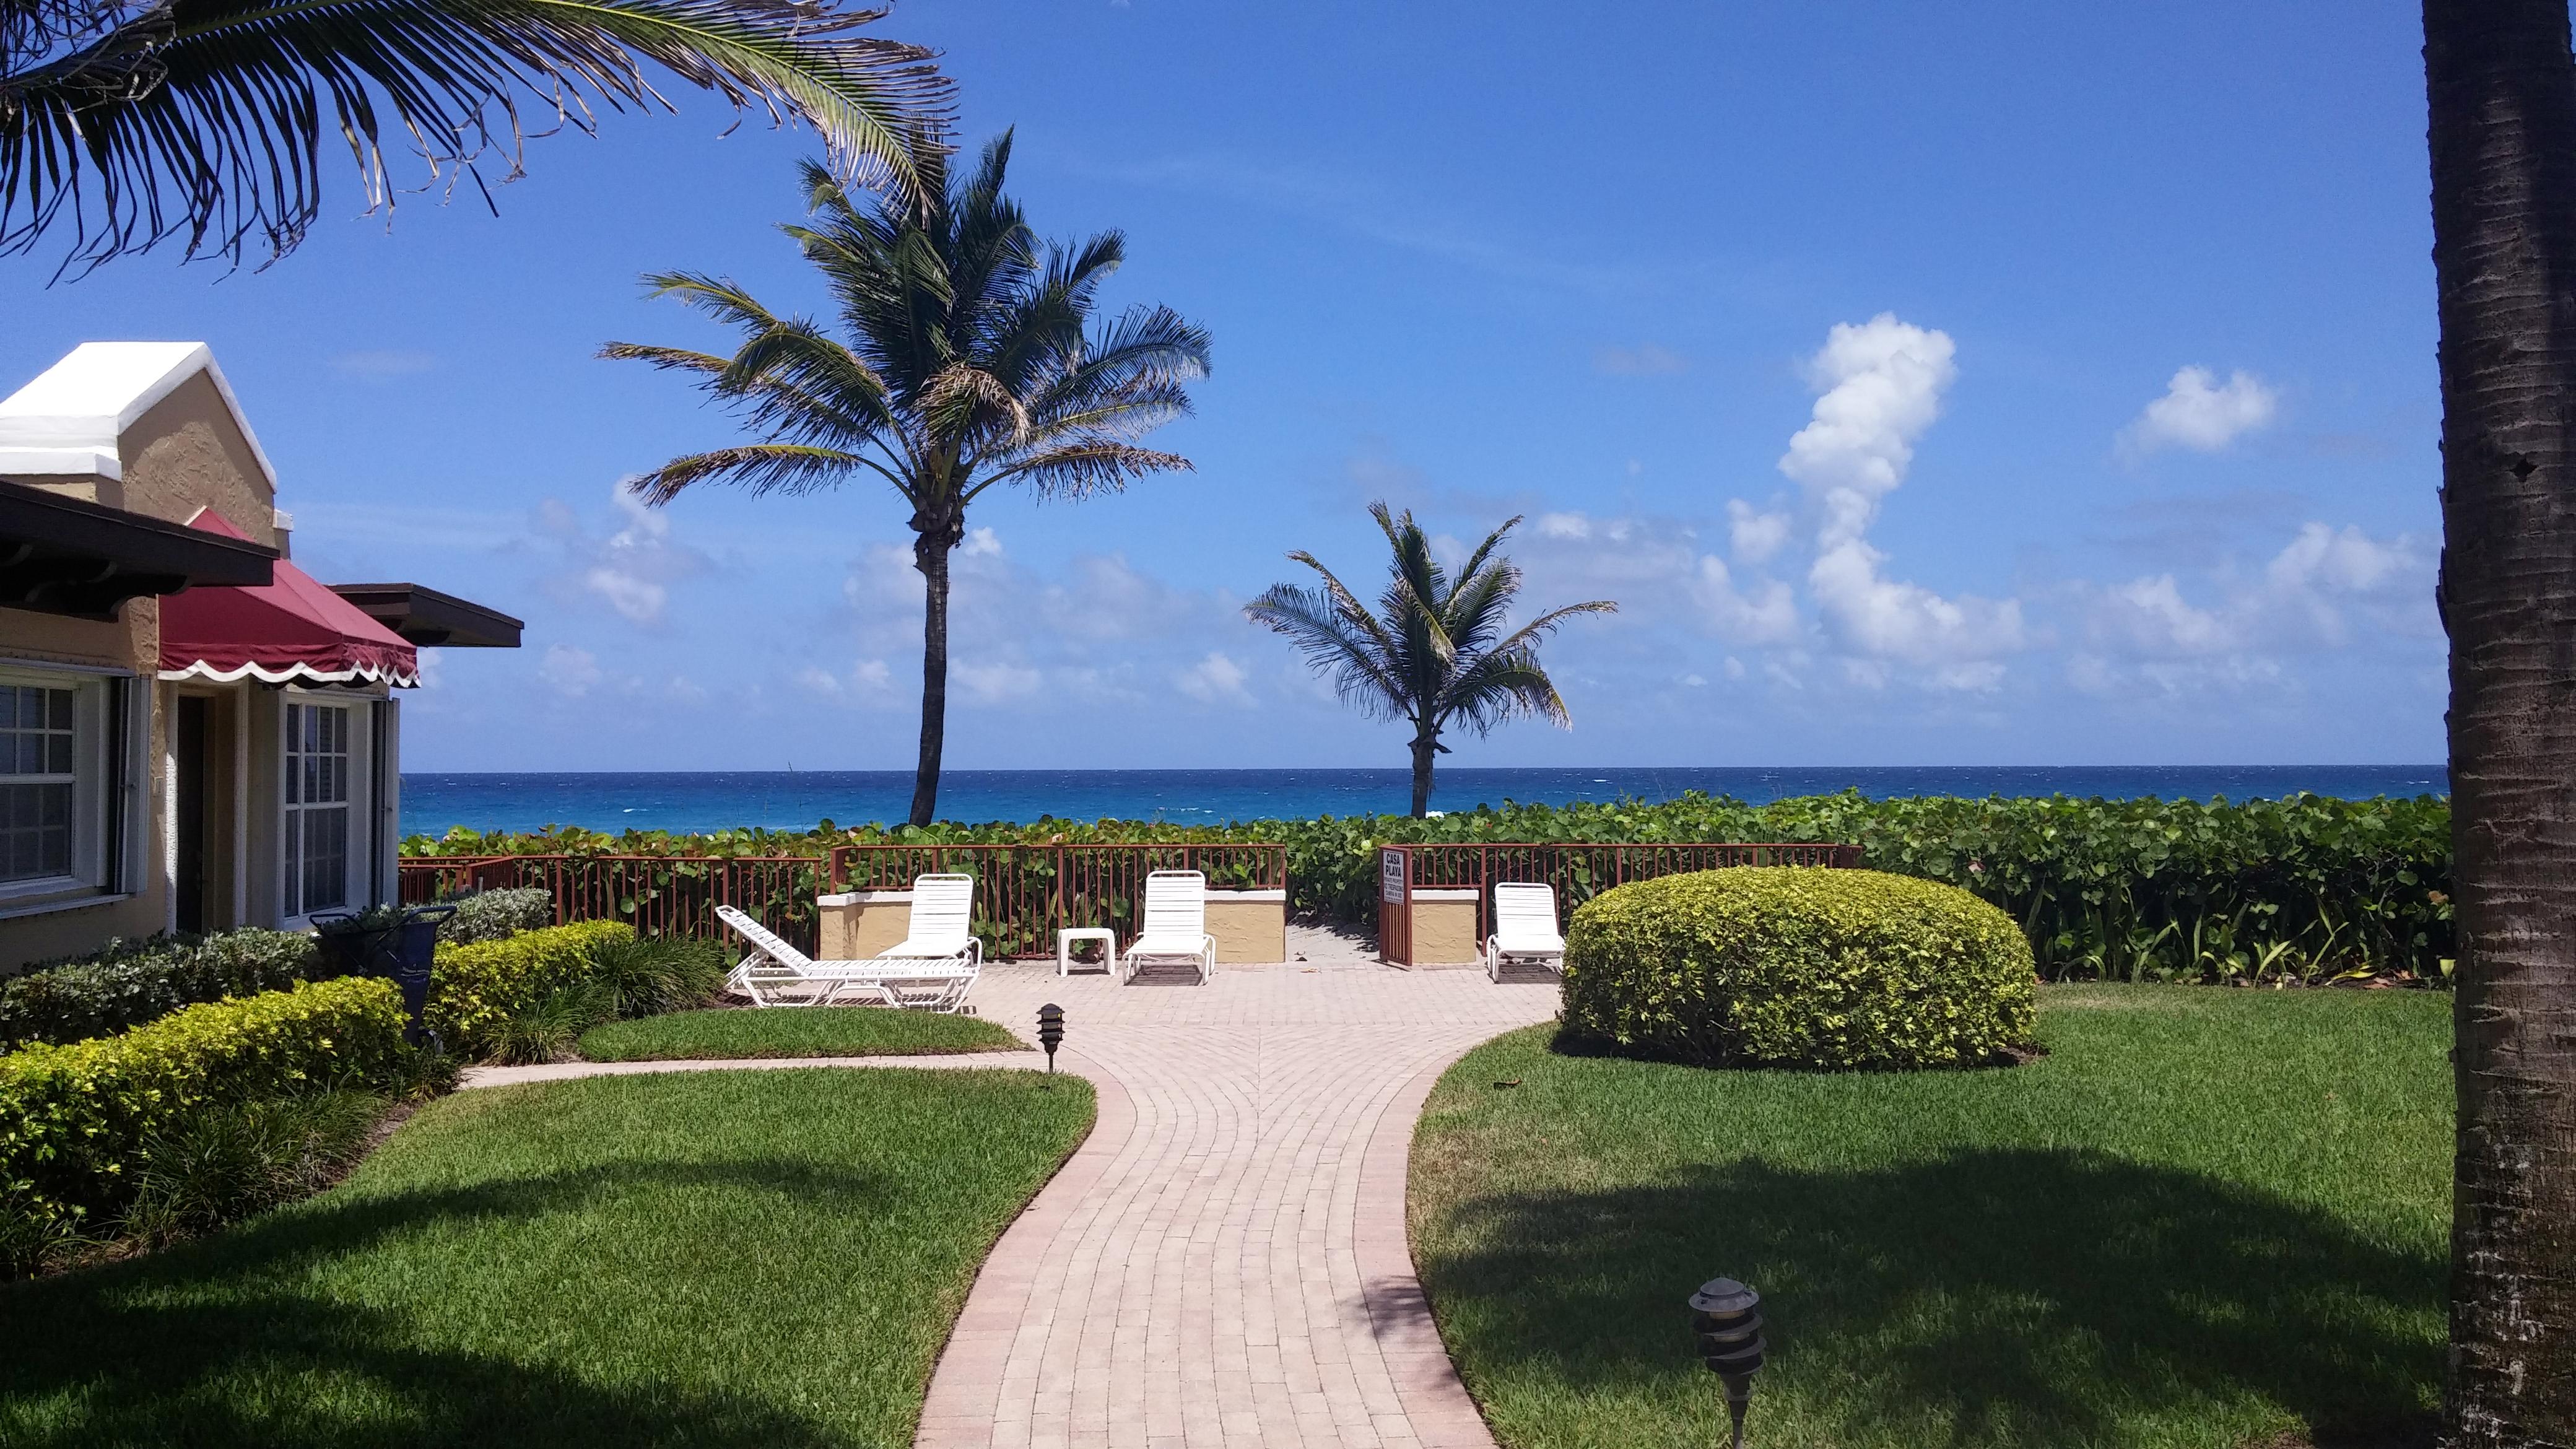 fileboca raton florida private beach by d ramey loganjpg